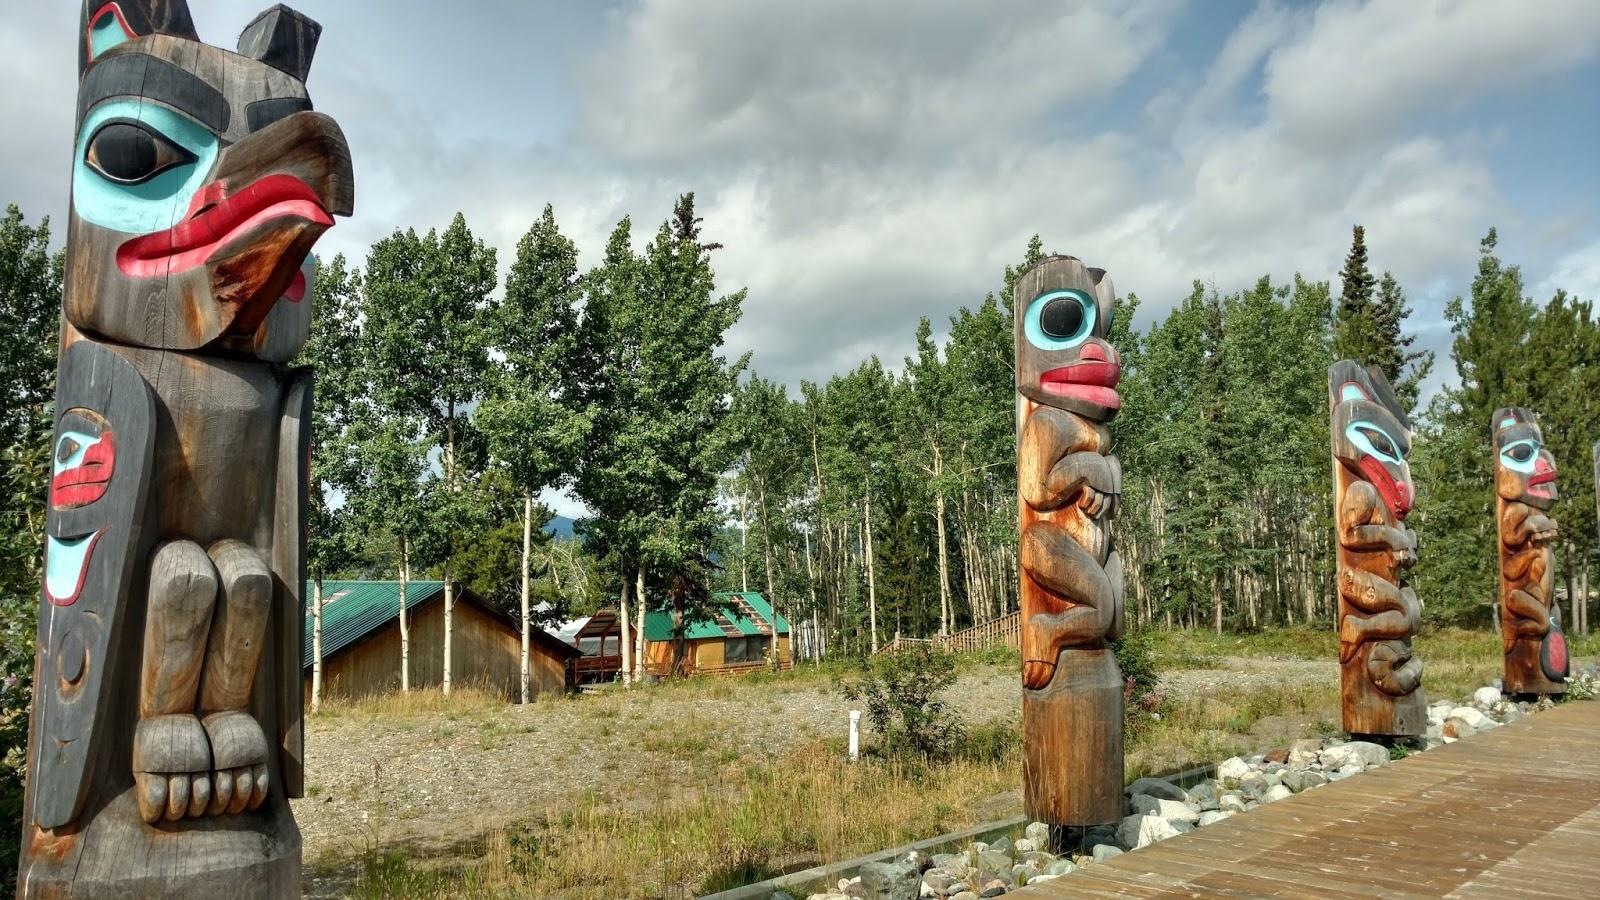 Tlingit Arts And Crafts